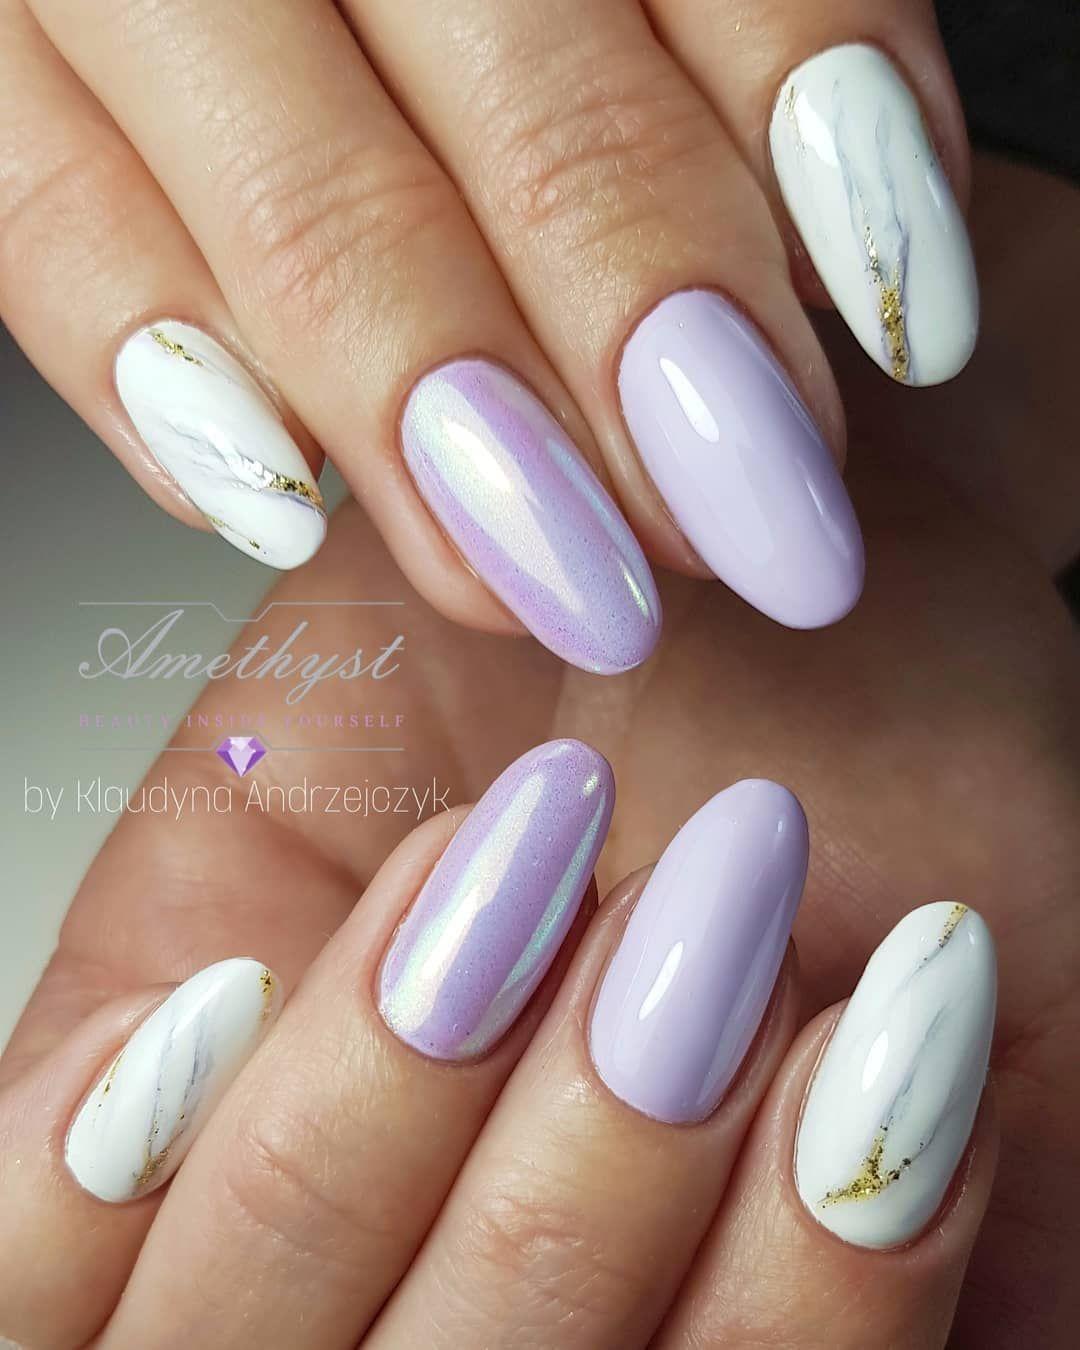 Amethyst Klaudia Gozdek On Instagram Makear Pl 540 Nails